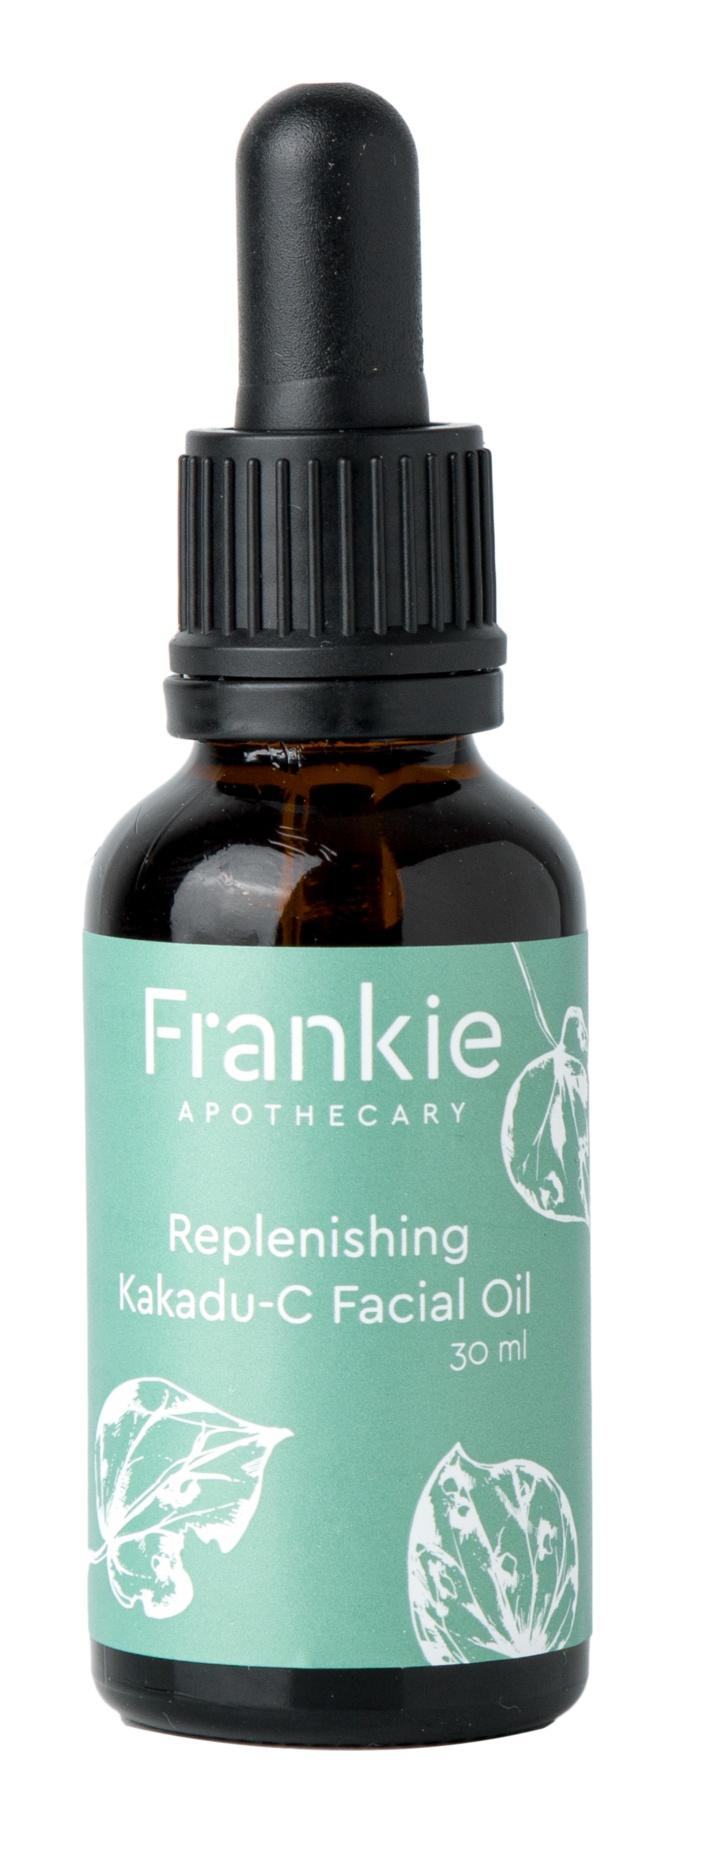 Frankie Apothecary Replenishing Kakadu-C Facial Oil